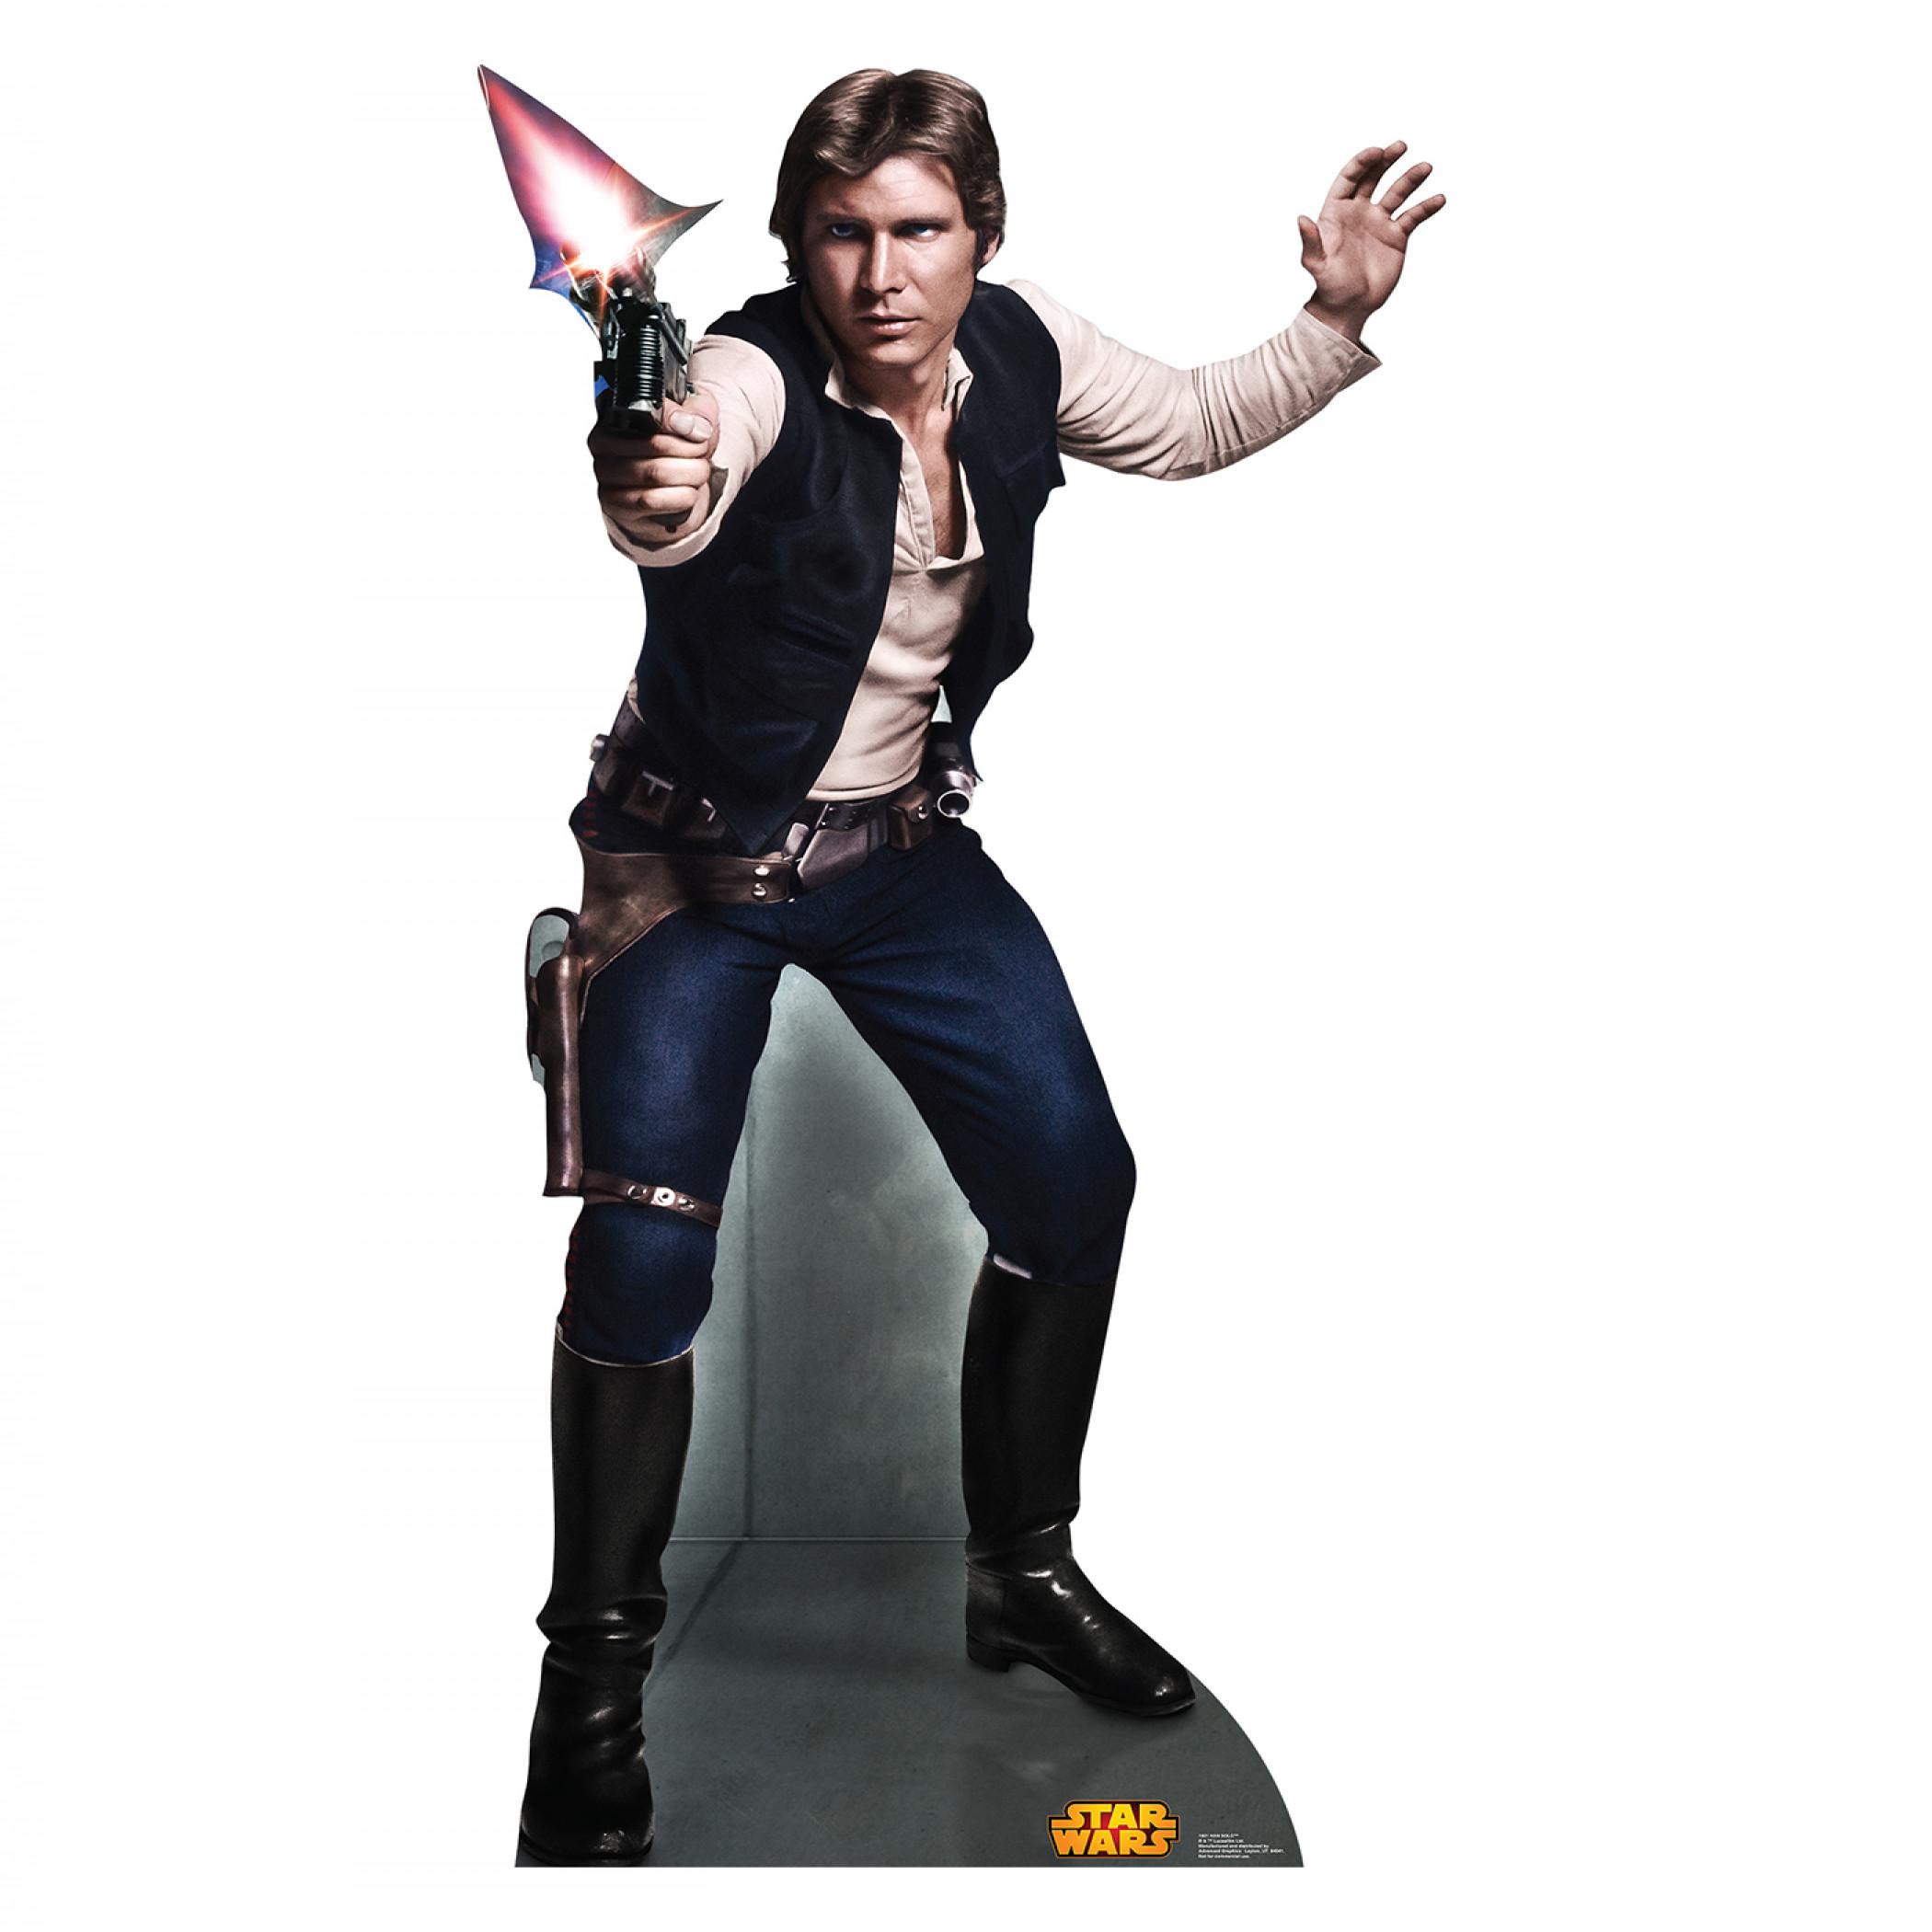 Star Wars Han Solo Cardboard Stand Up